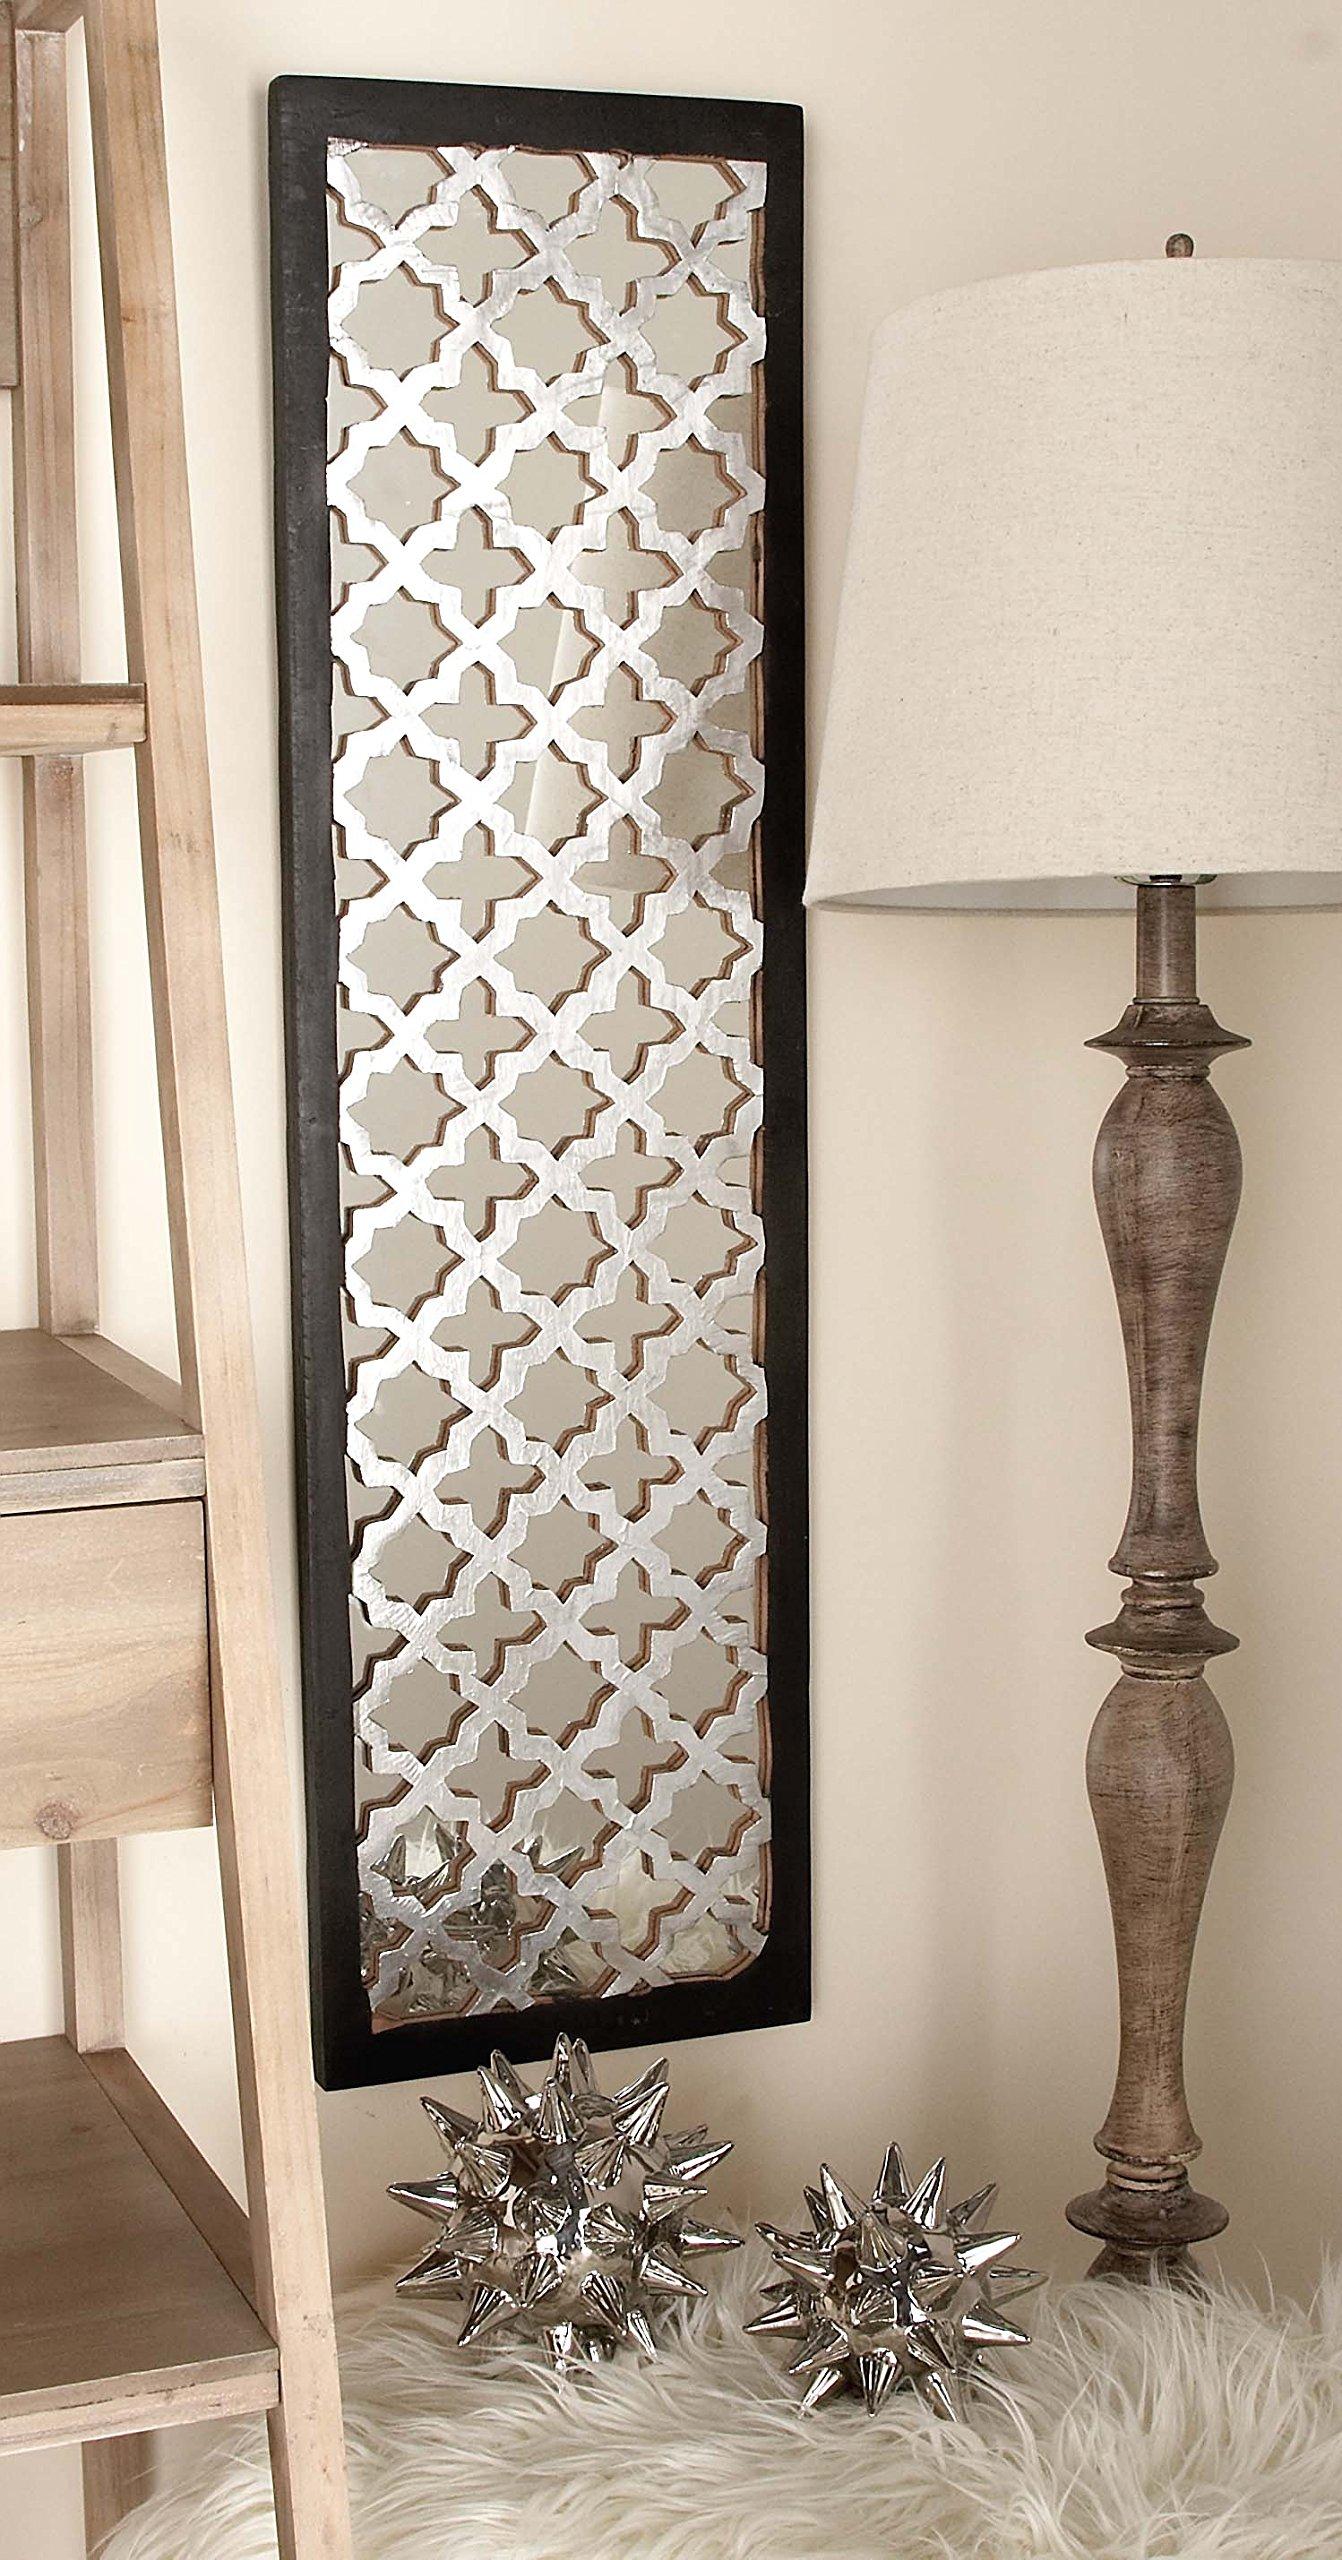 Deco 79 Wood Metal Mirror Panel 2 Assorted 12''W, 44''H